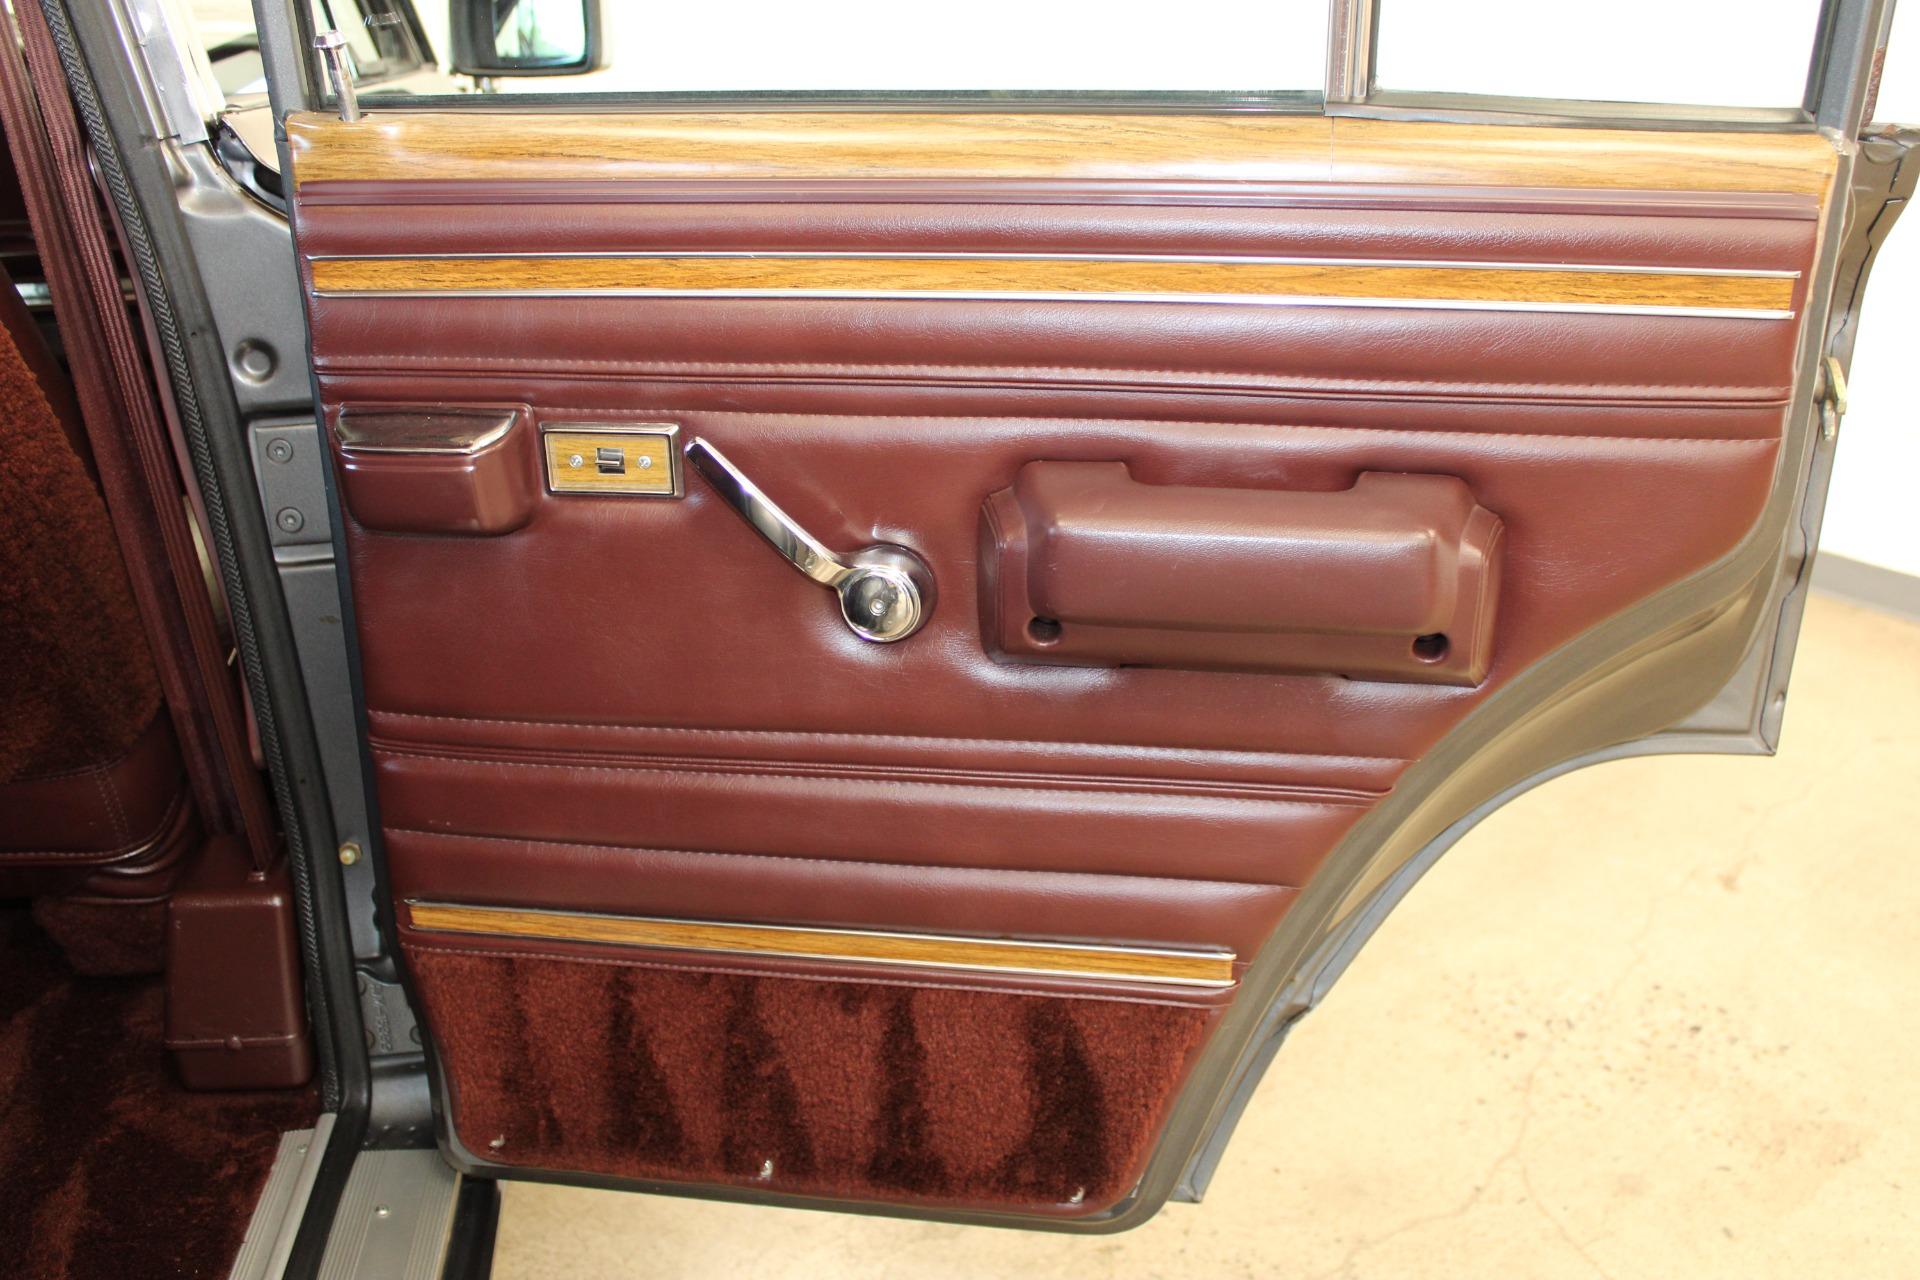 Used-1989-Jeep-Grand-Wagoneer-Dodge